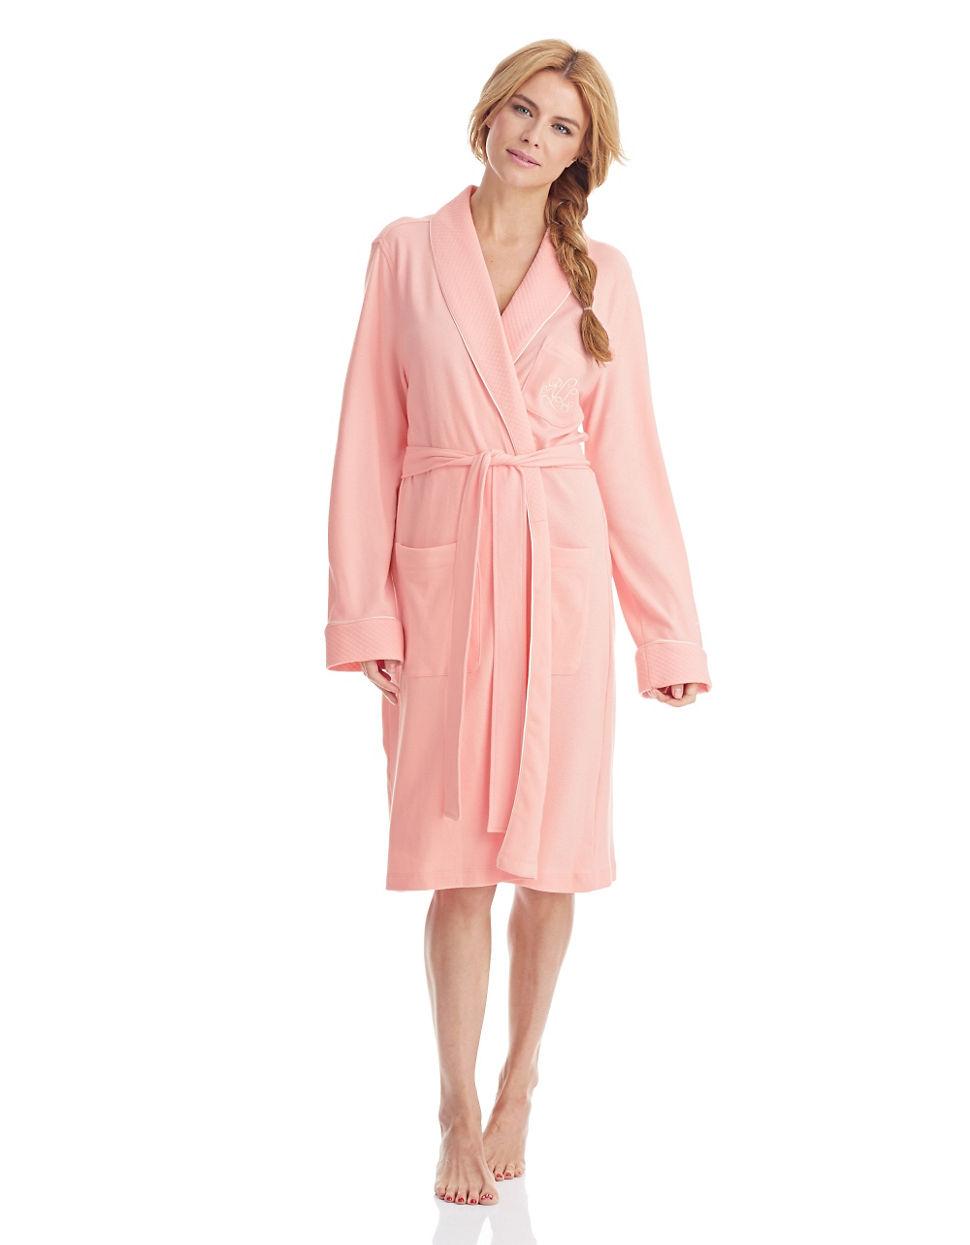 Lyst lauren by ralph lauren the hartford robe with for Robe chemise ralph lauren